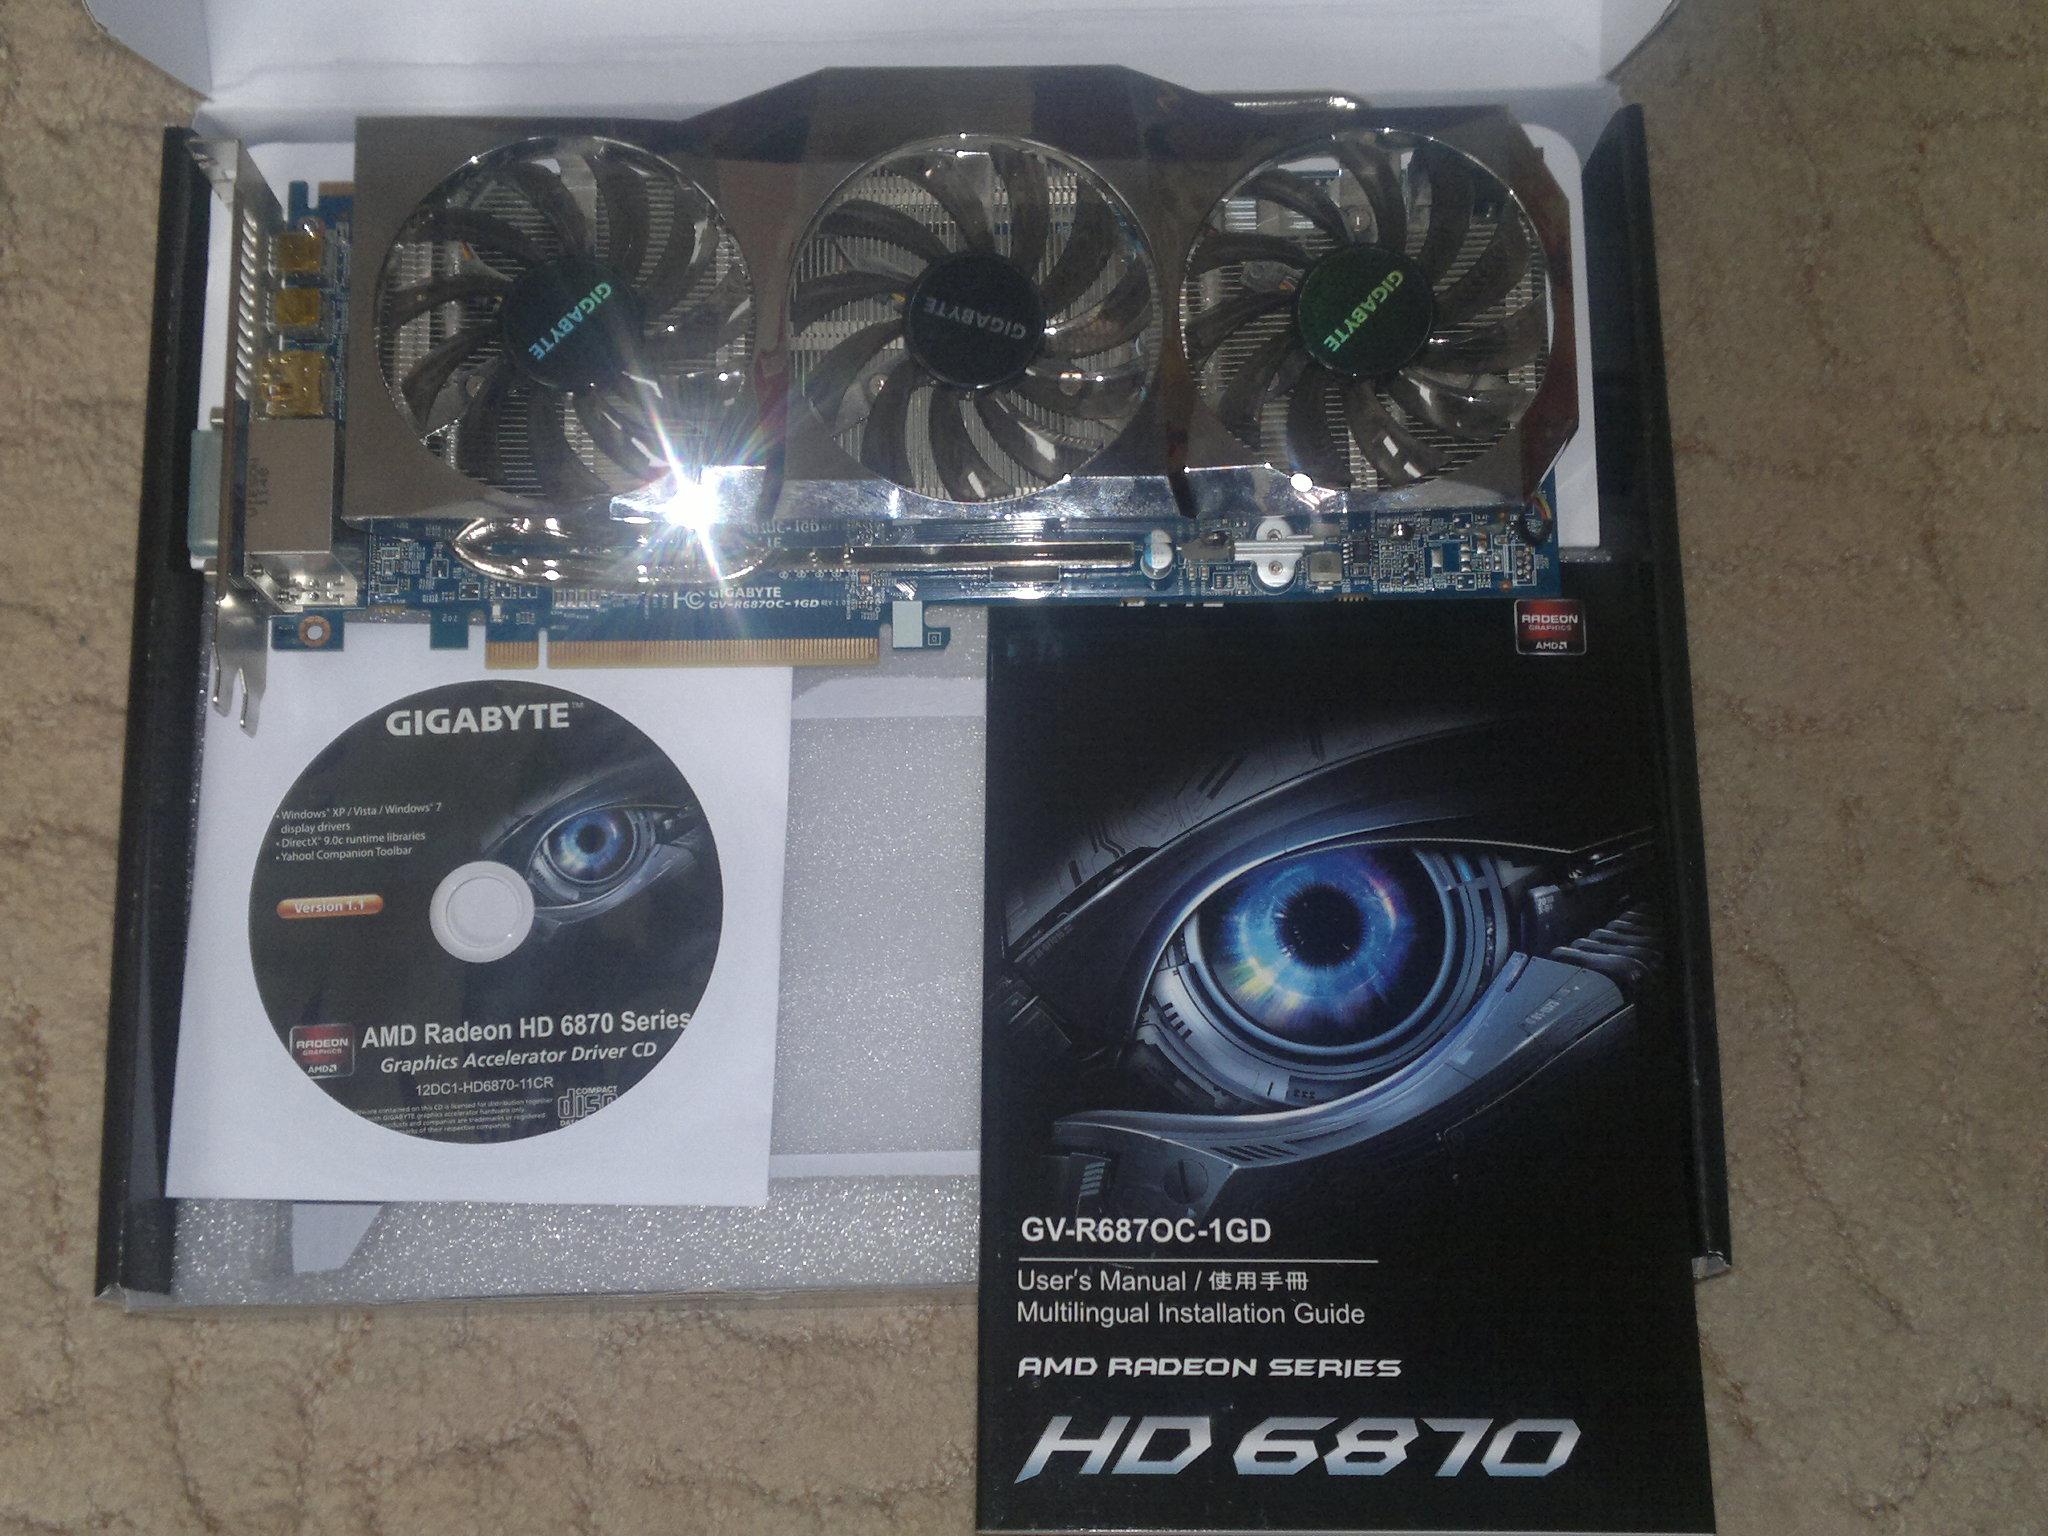 Sprzedam Gigabyte Radeon HD 6870 Super Overclock 14 mies GW